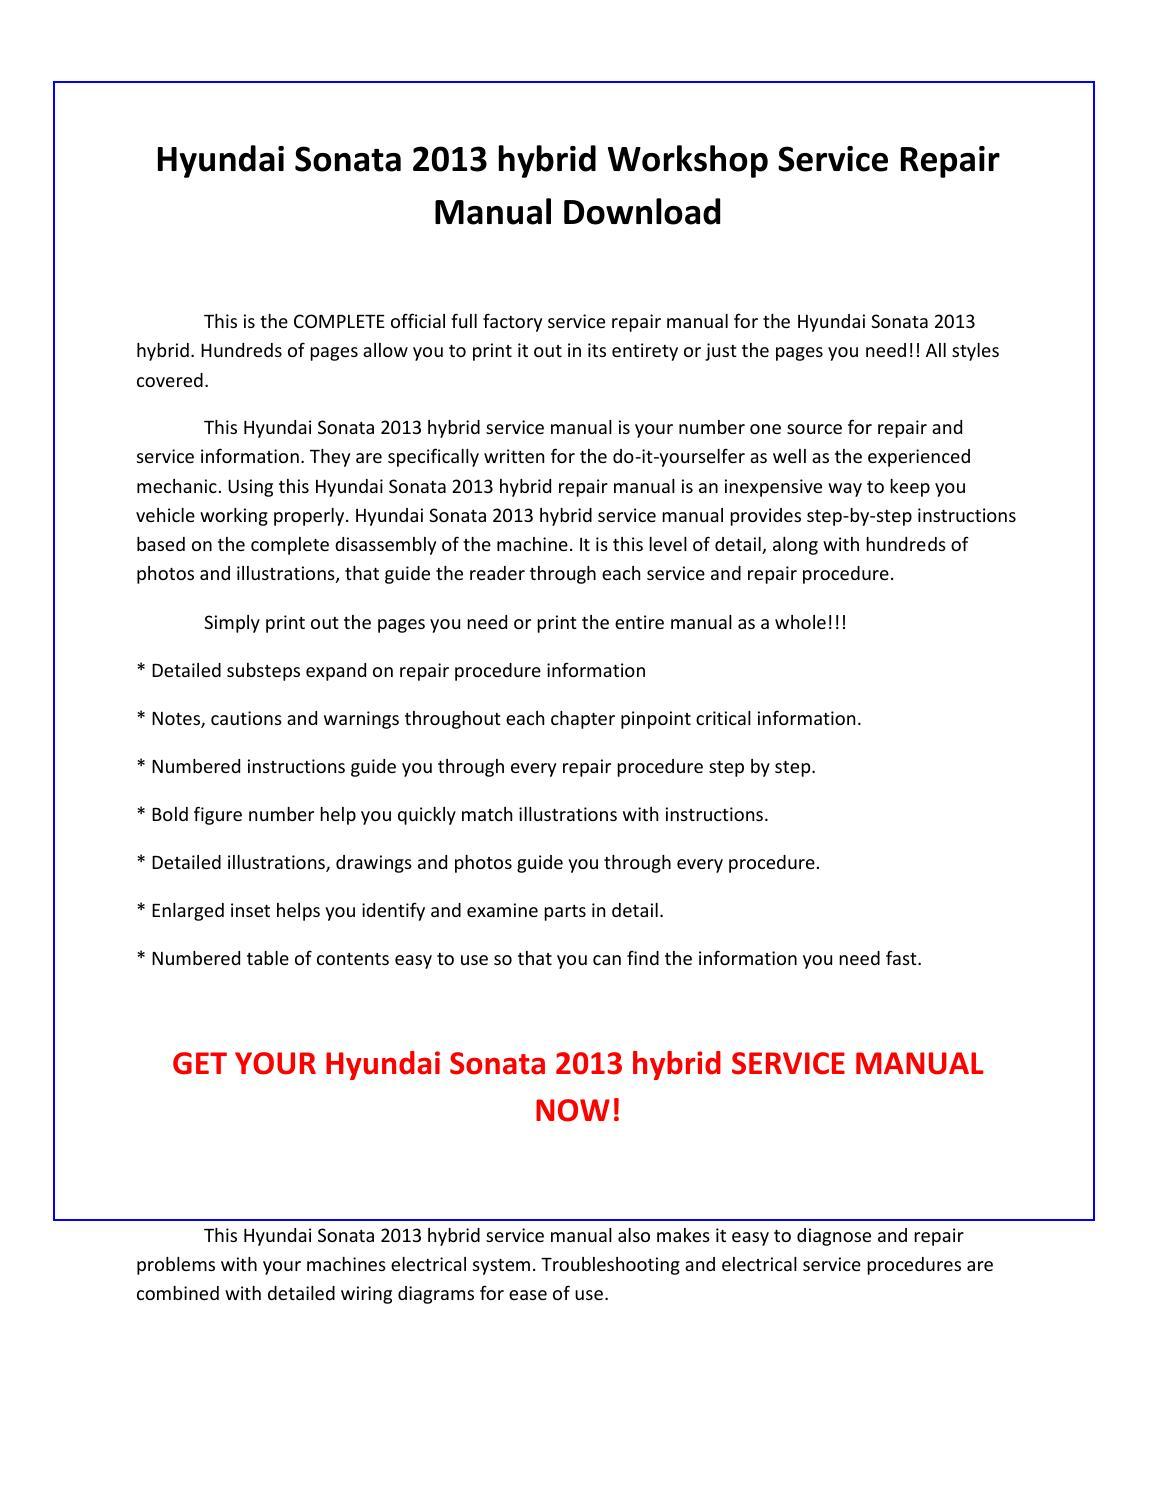 2004 hyundai sonata repair manual pdf